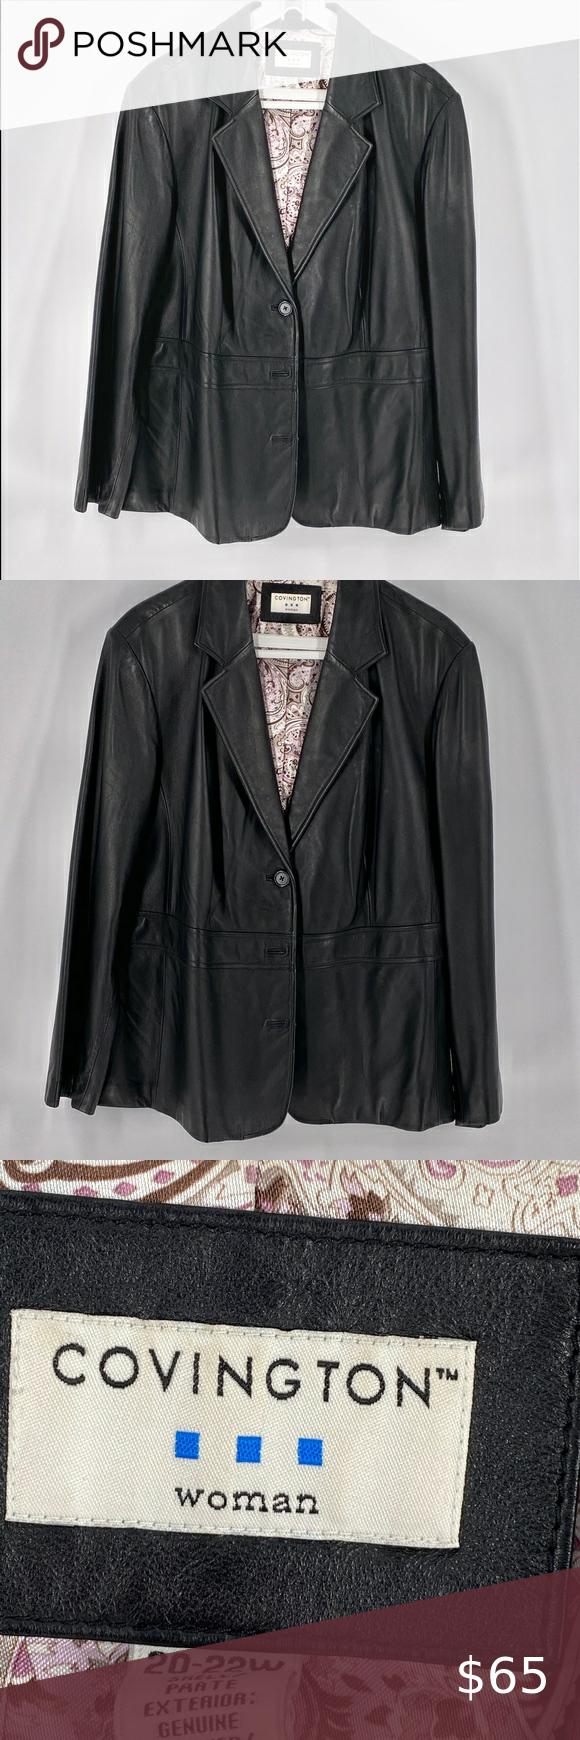 Covington Black Leather Jacket 20w 22w Black Leather Jacket Leather Jacket Black Leather [ 1740 x 580 Pixel ]